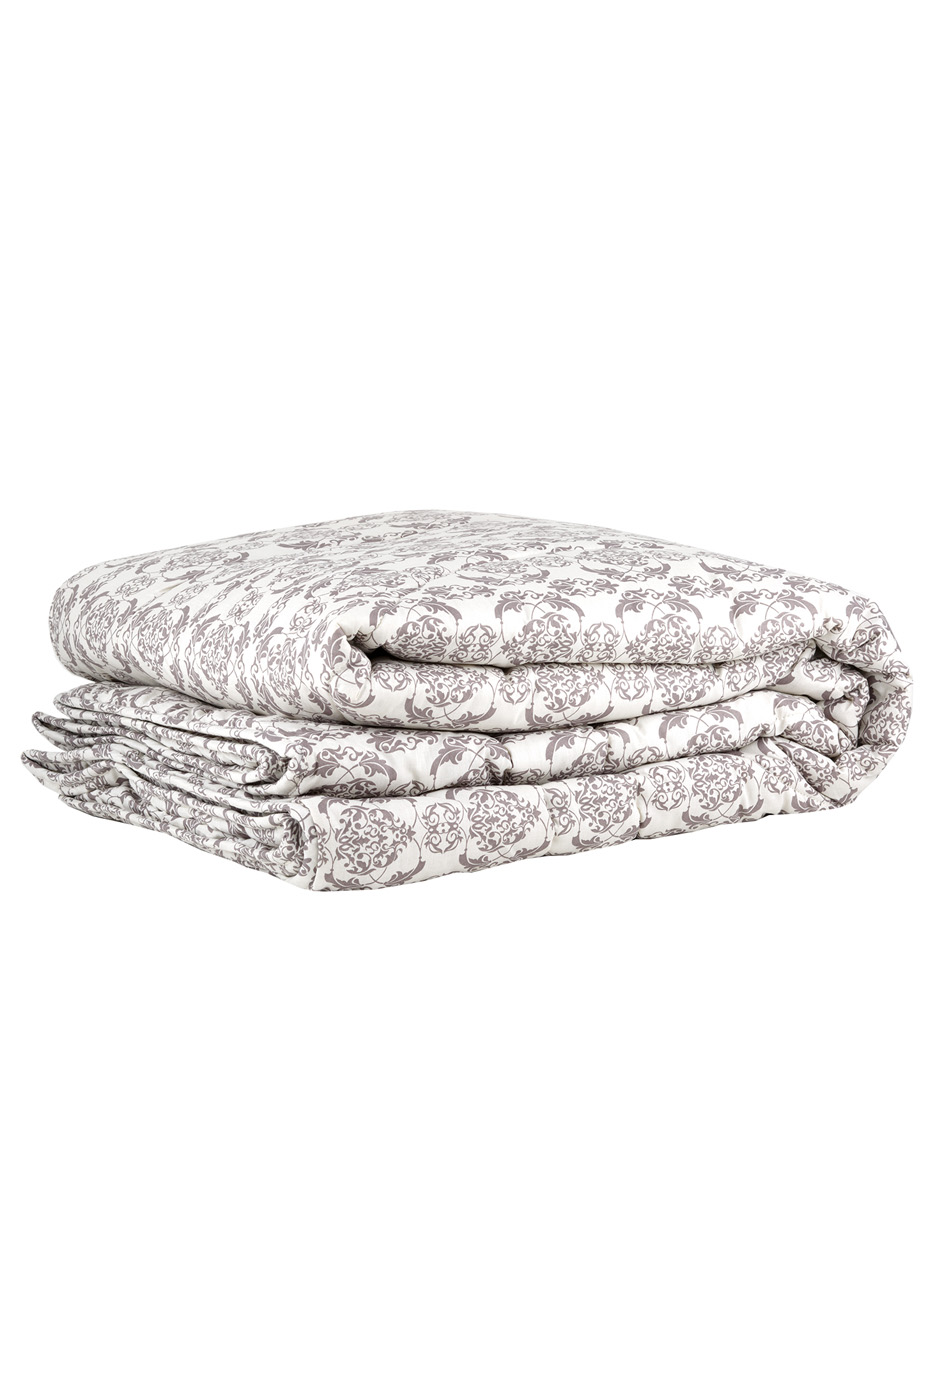 Одеяла CLASSIC by T Одеяло Софт Премиум Теплое (140х200 см) одеяло classic by t верблюжья шерсть